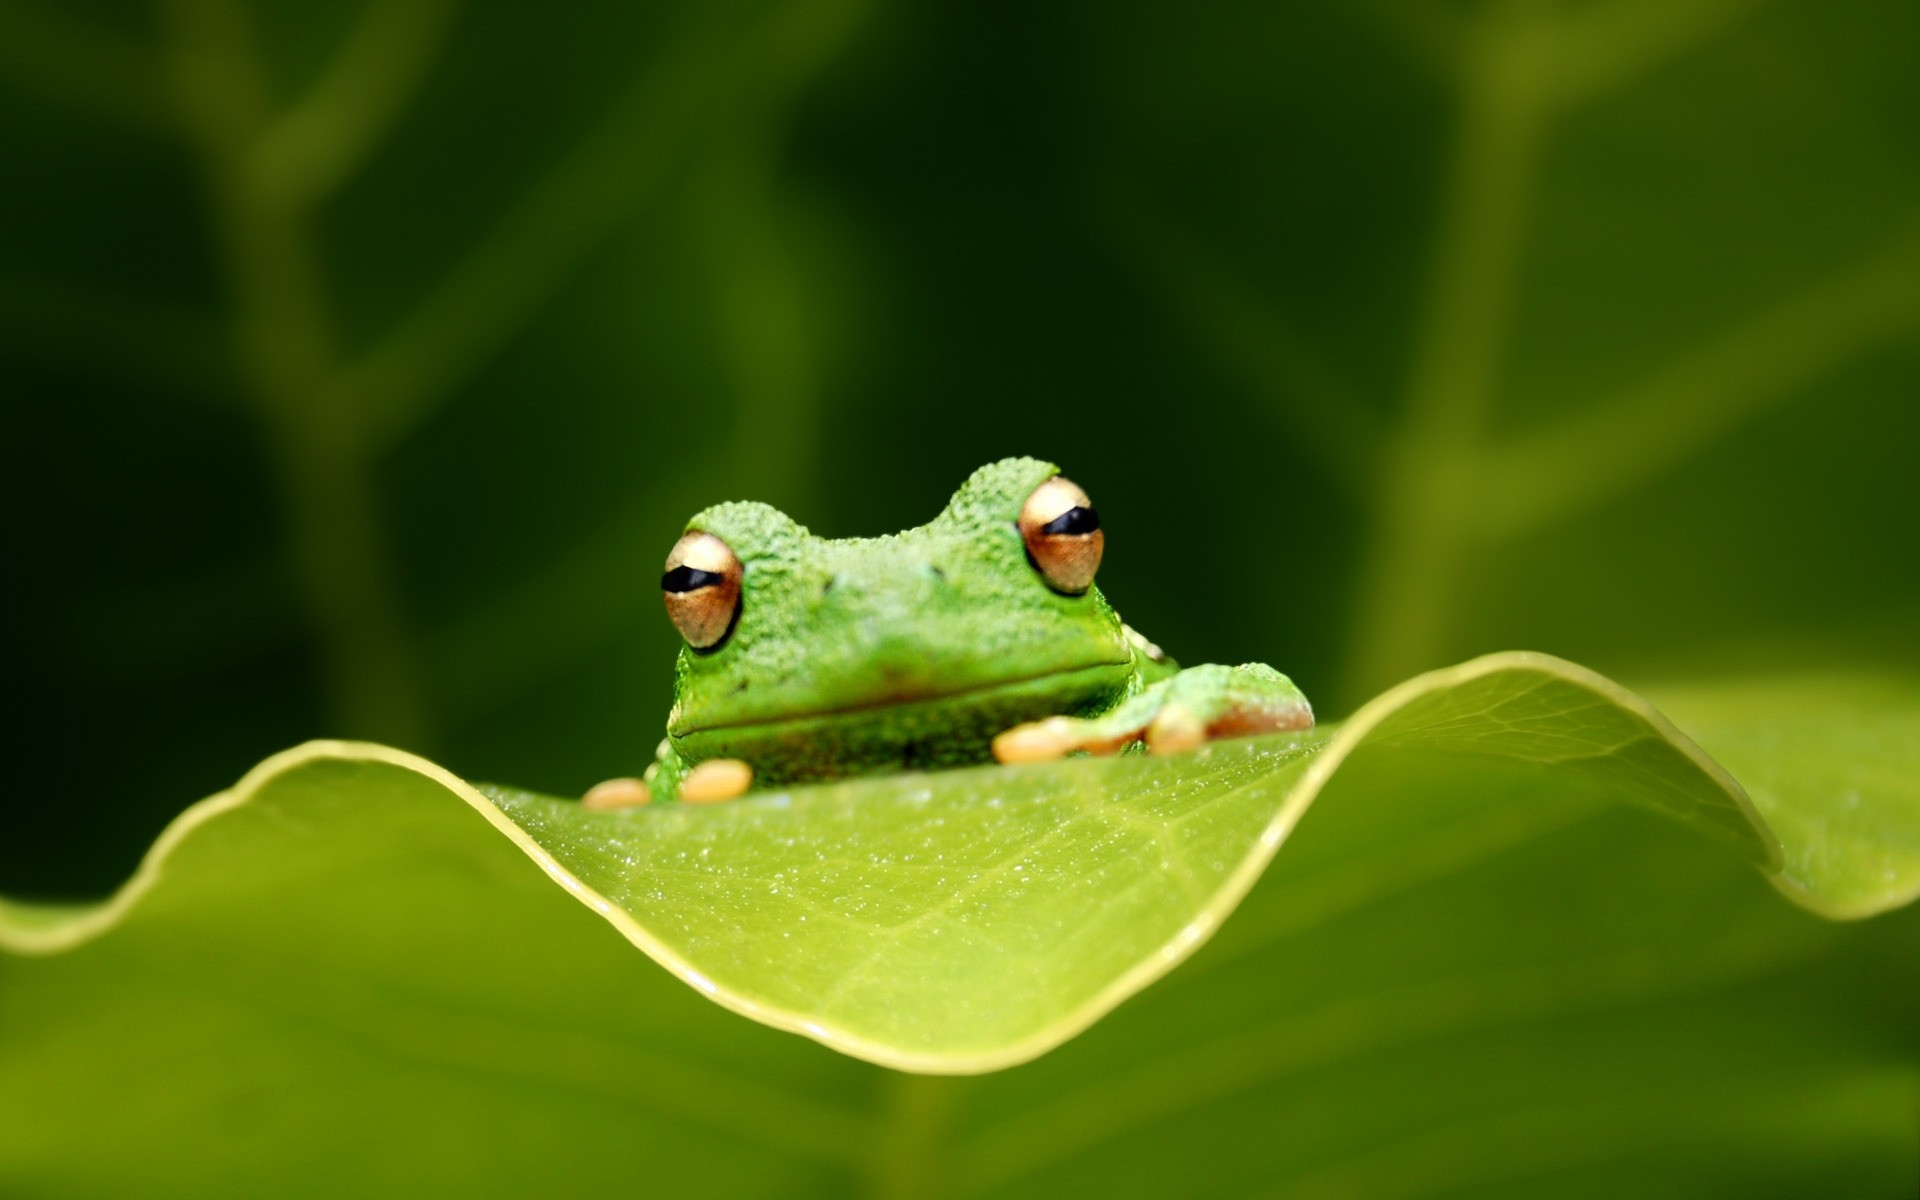 Лягушка бабочка на травинке загрузить